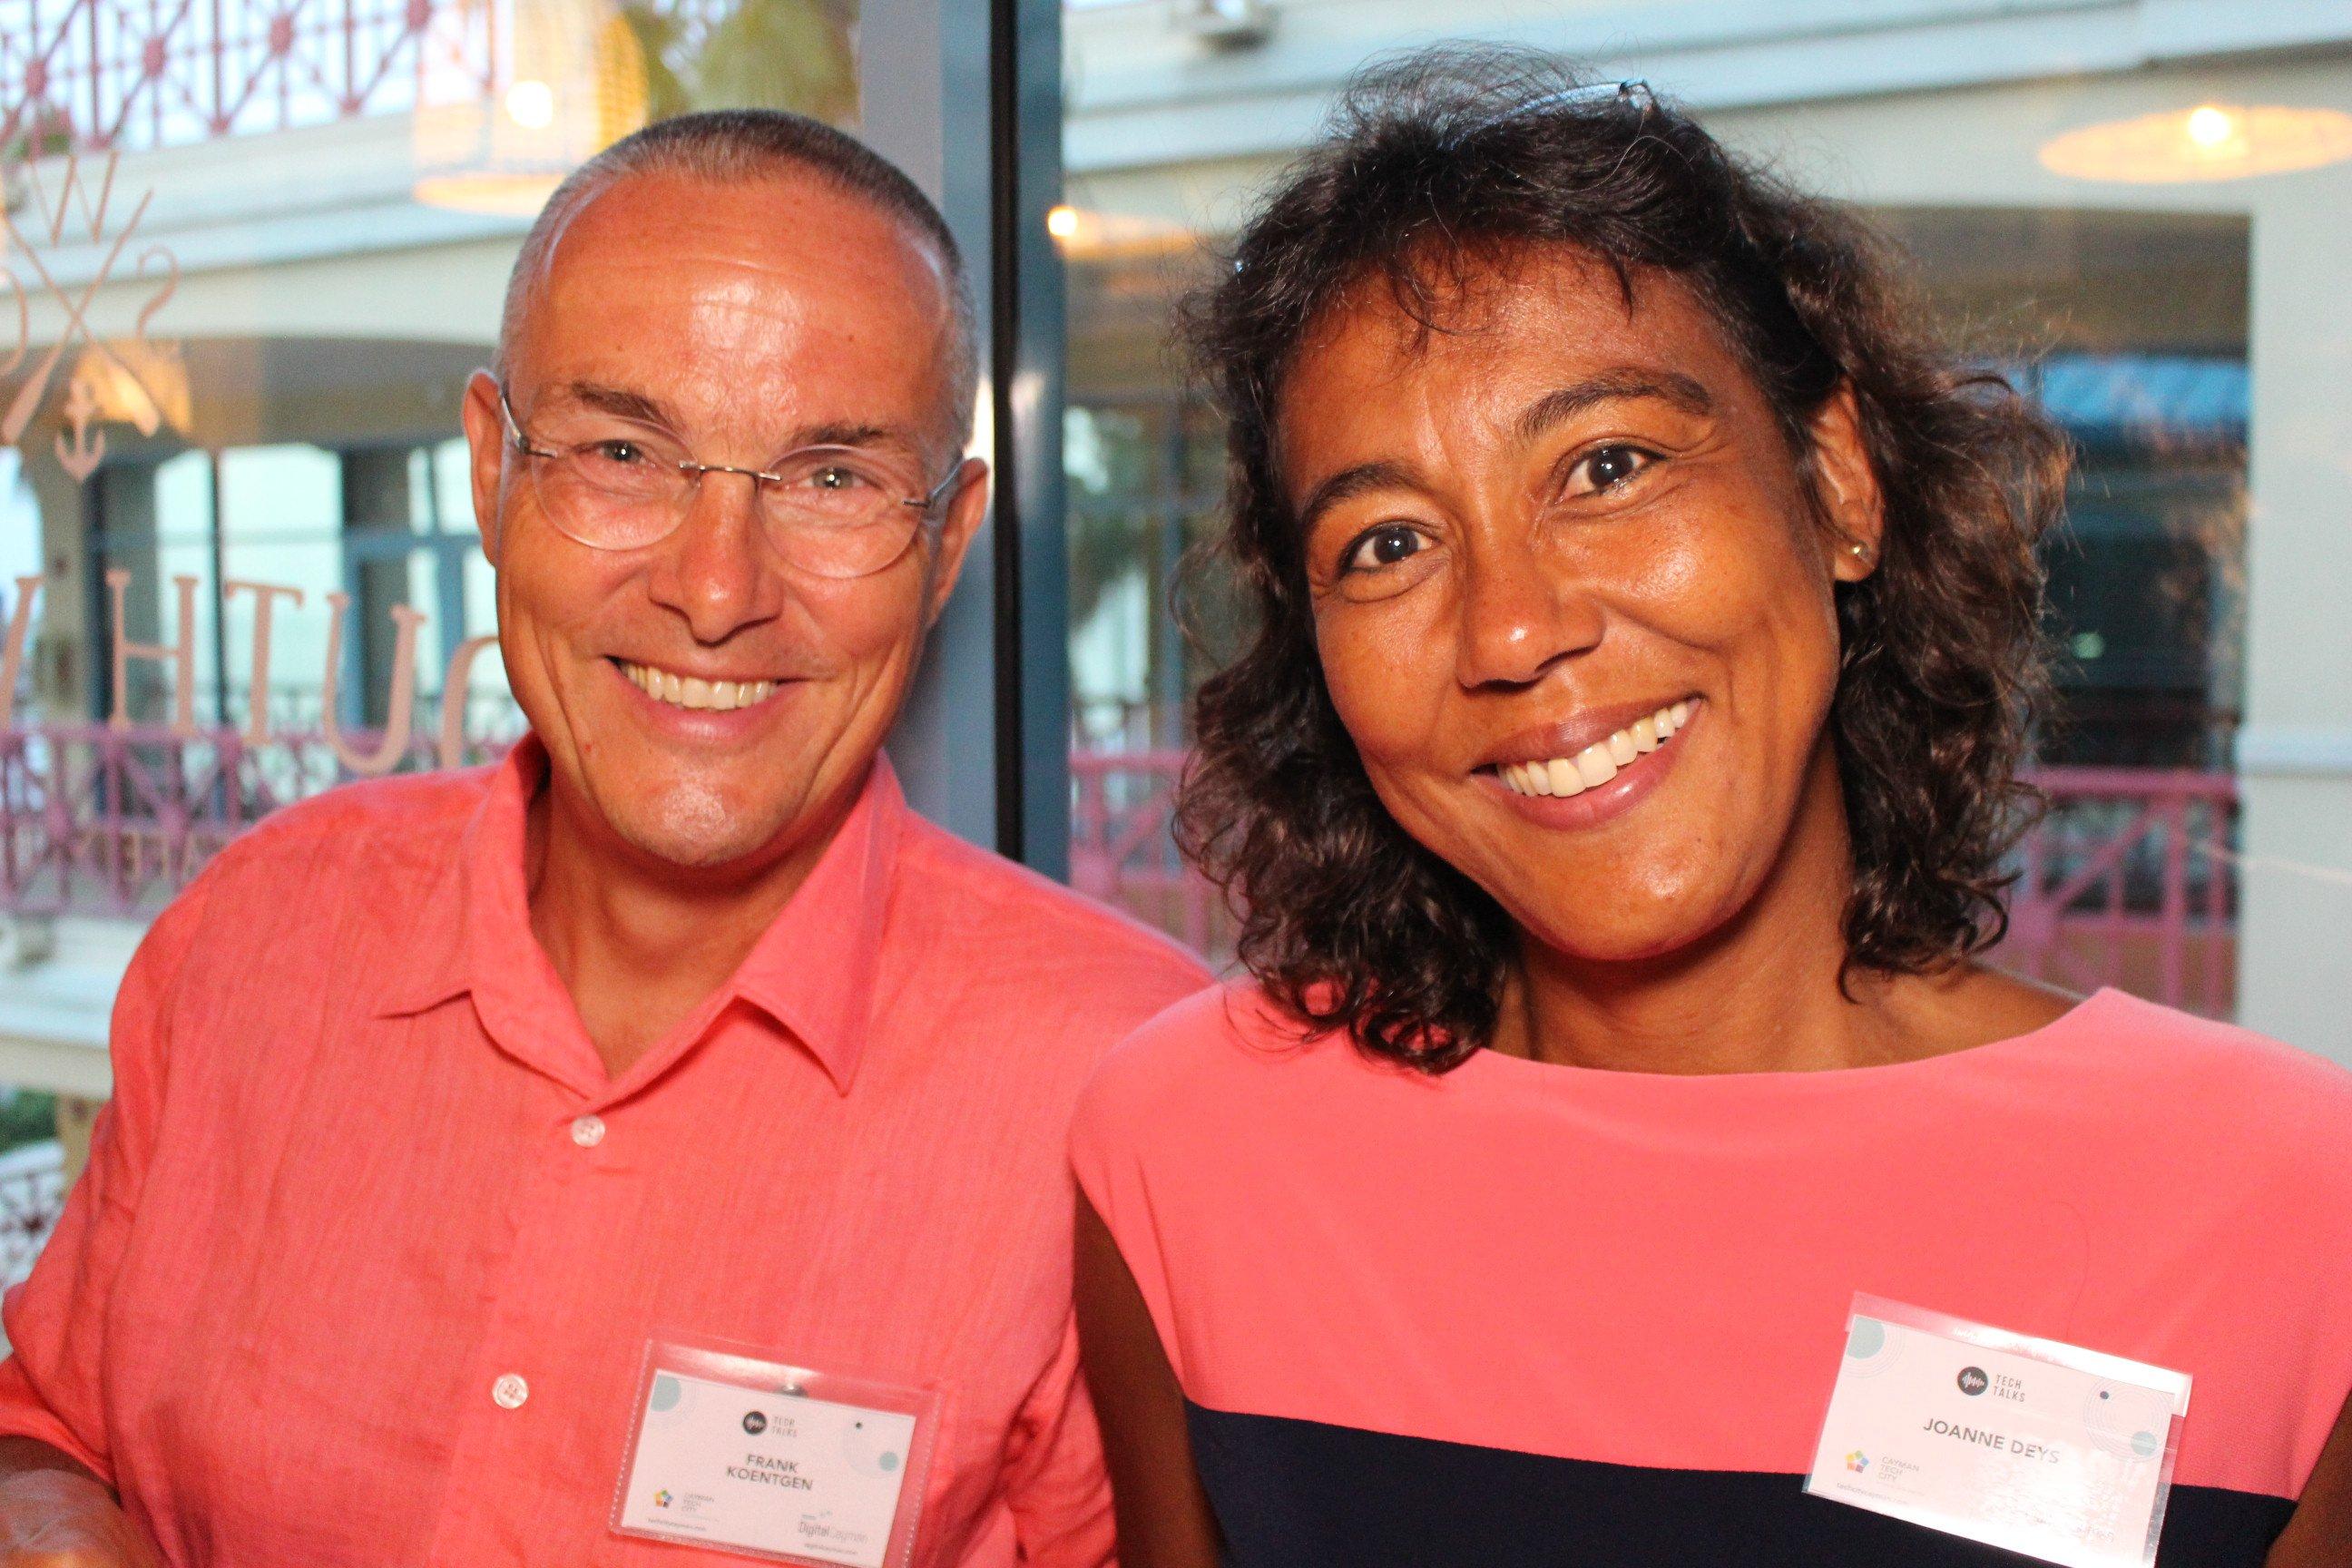 CEC Community Member Dr. Frank Koentgen and Joanne Deys